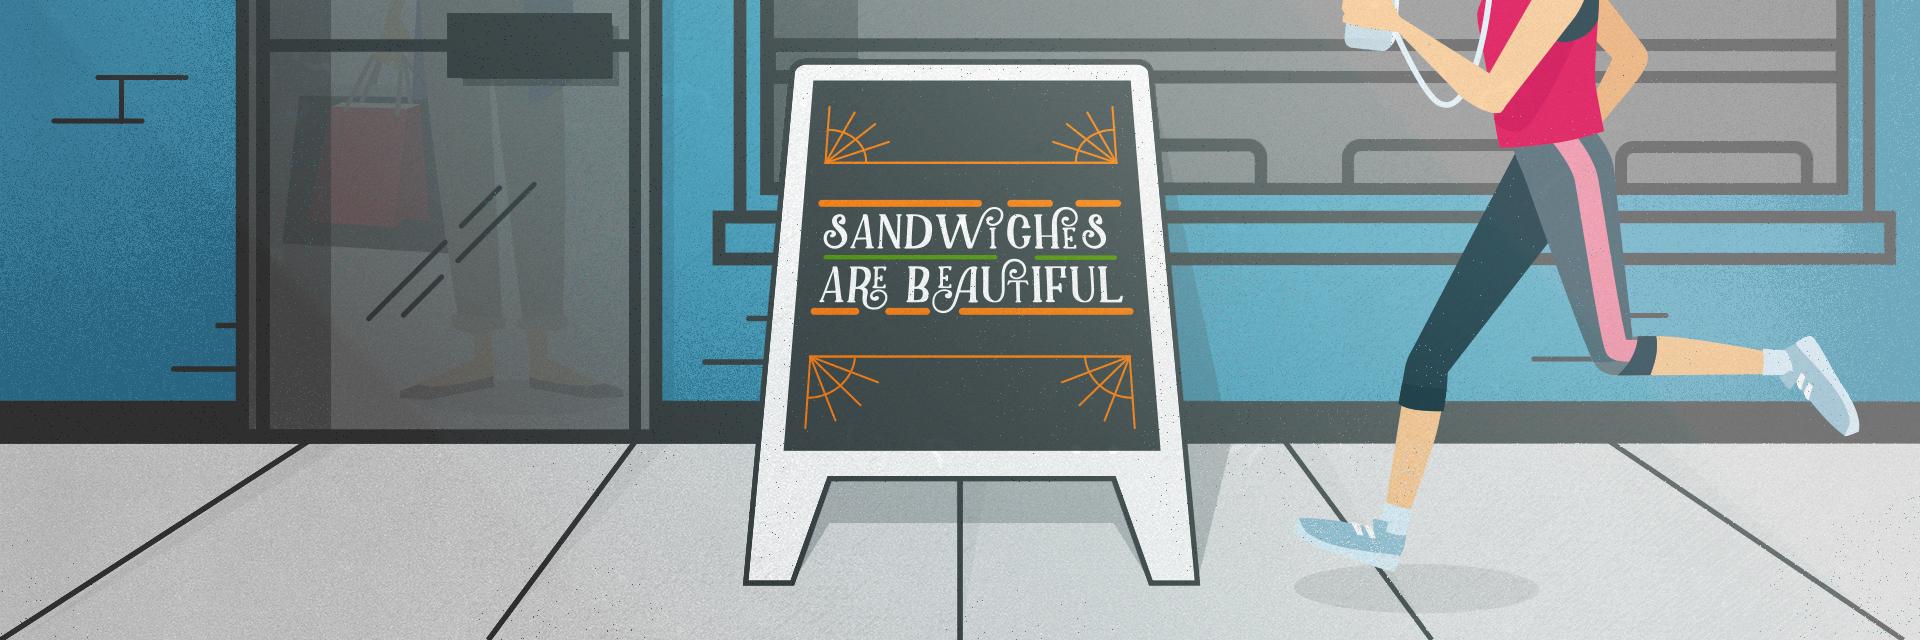 Sandwich (boards) are Beautiful